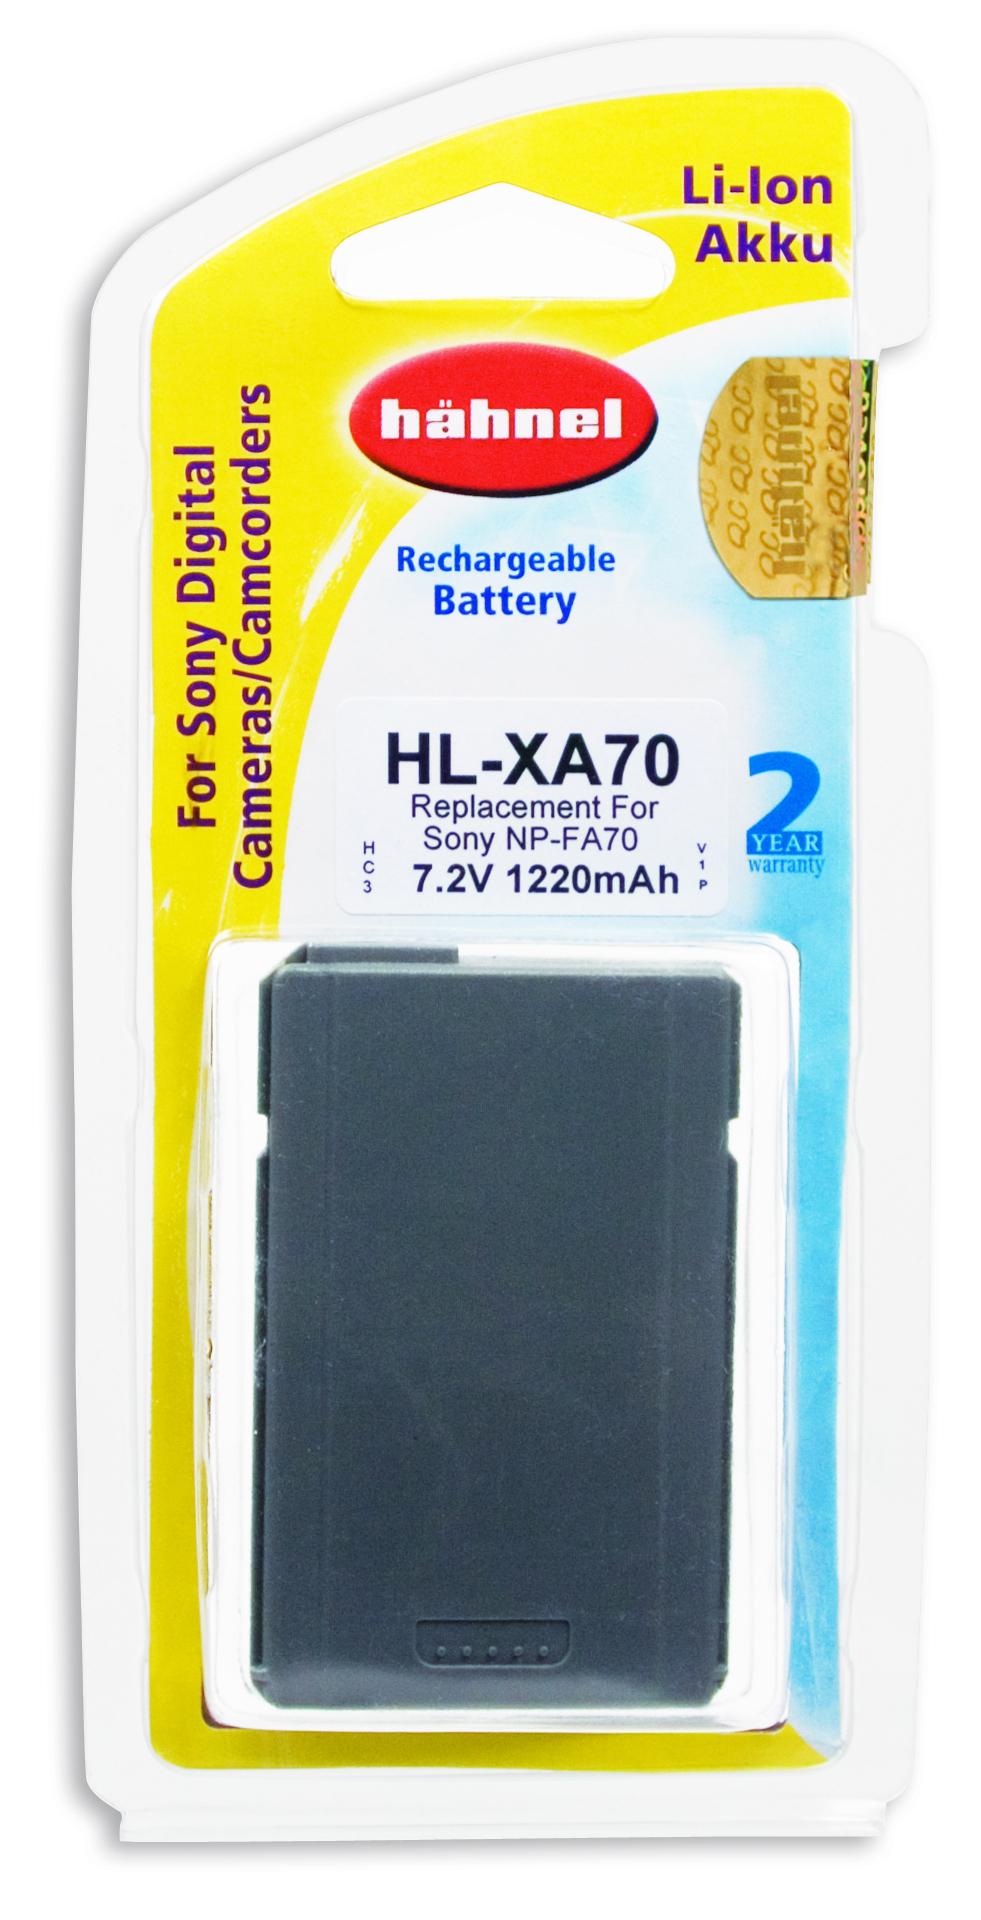 Hähnel HL-XA70